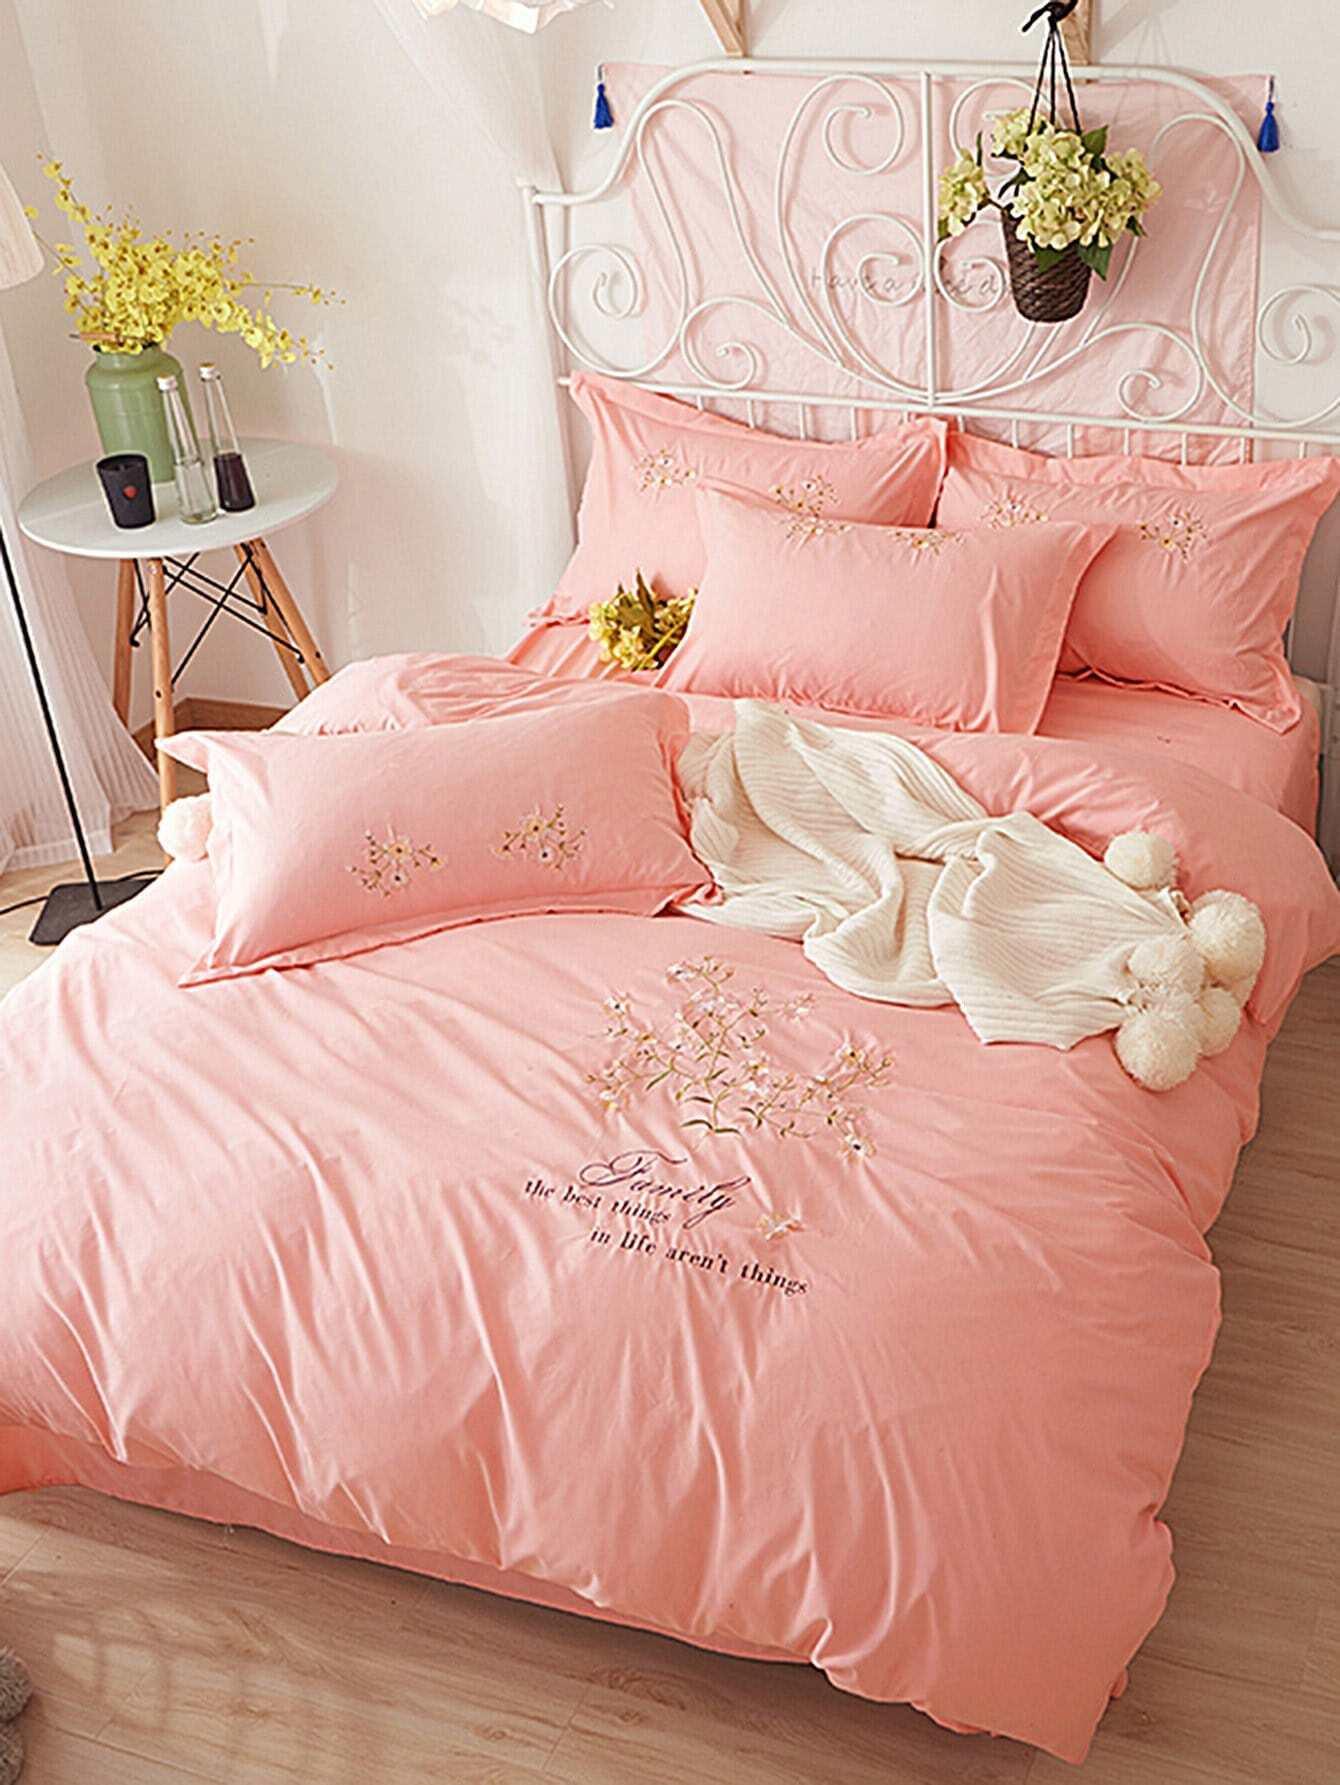 Flower Embroidery Bedding Set flower print bedding set